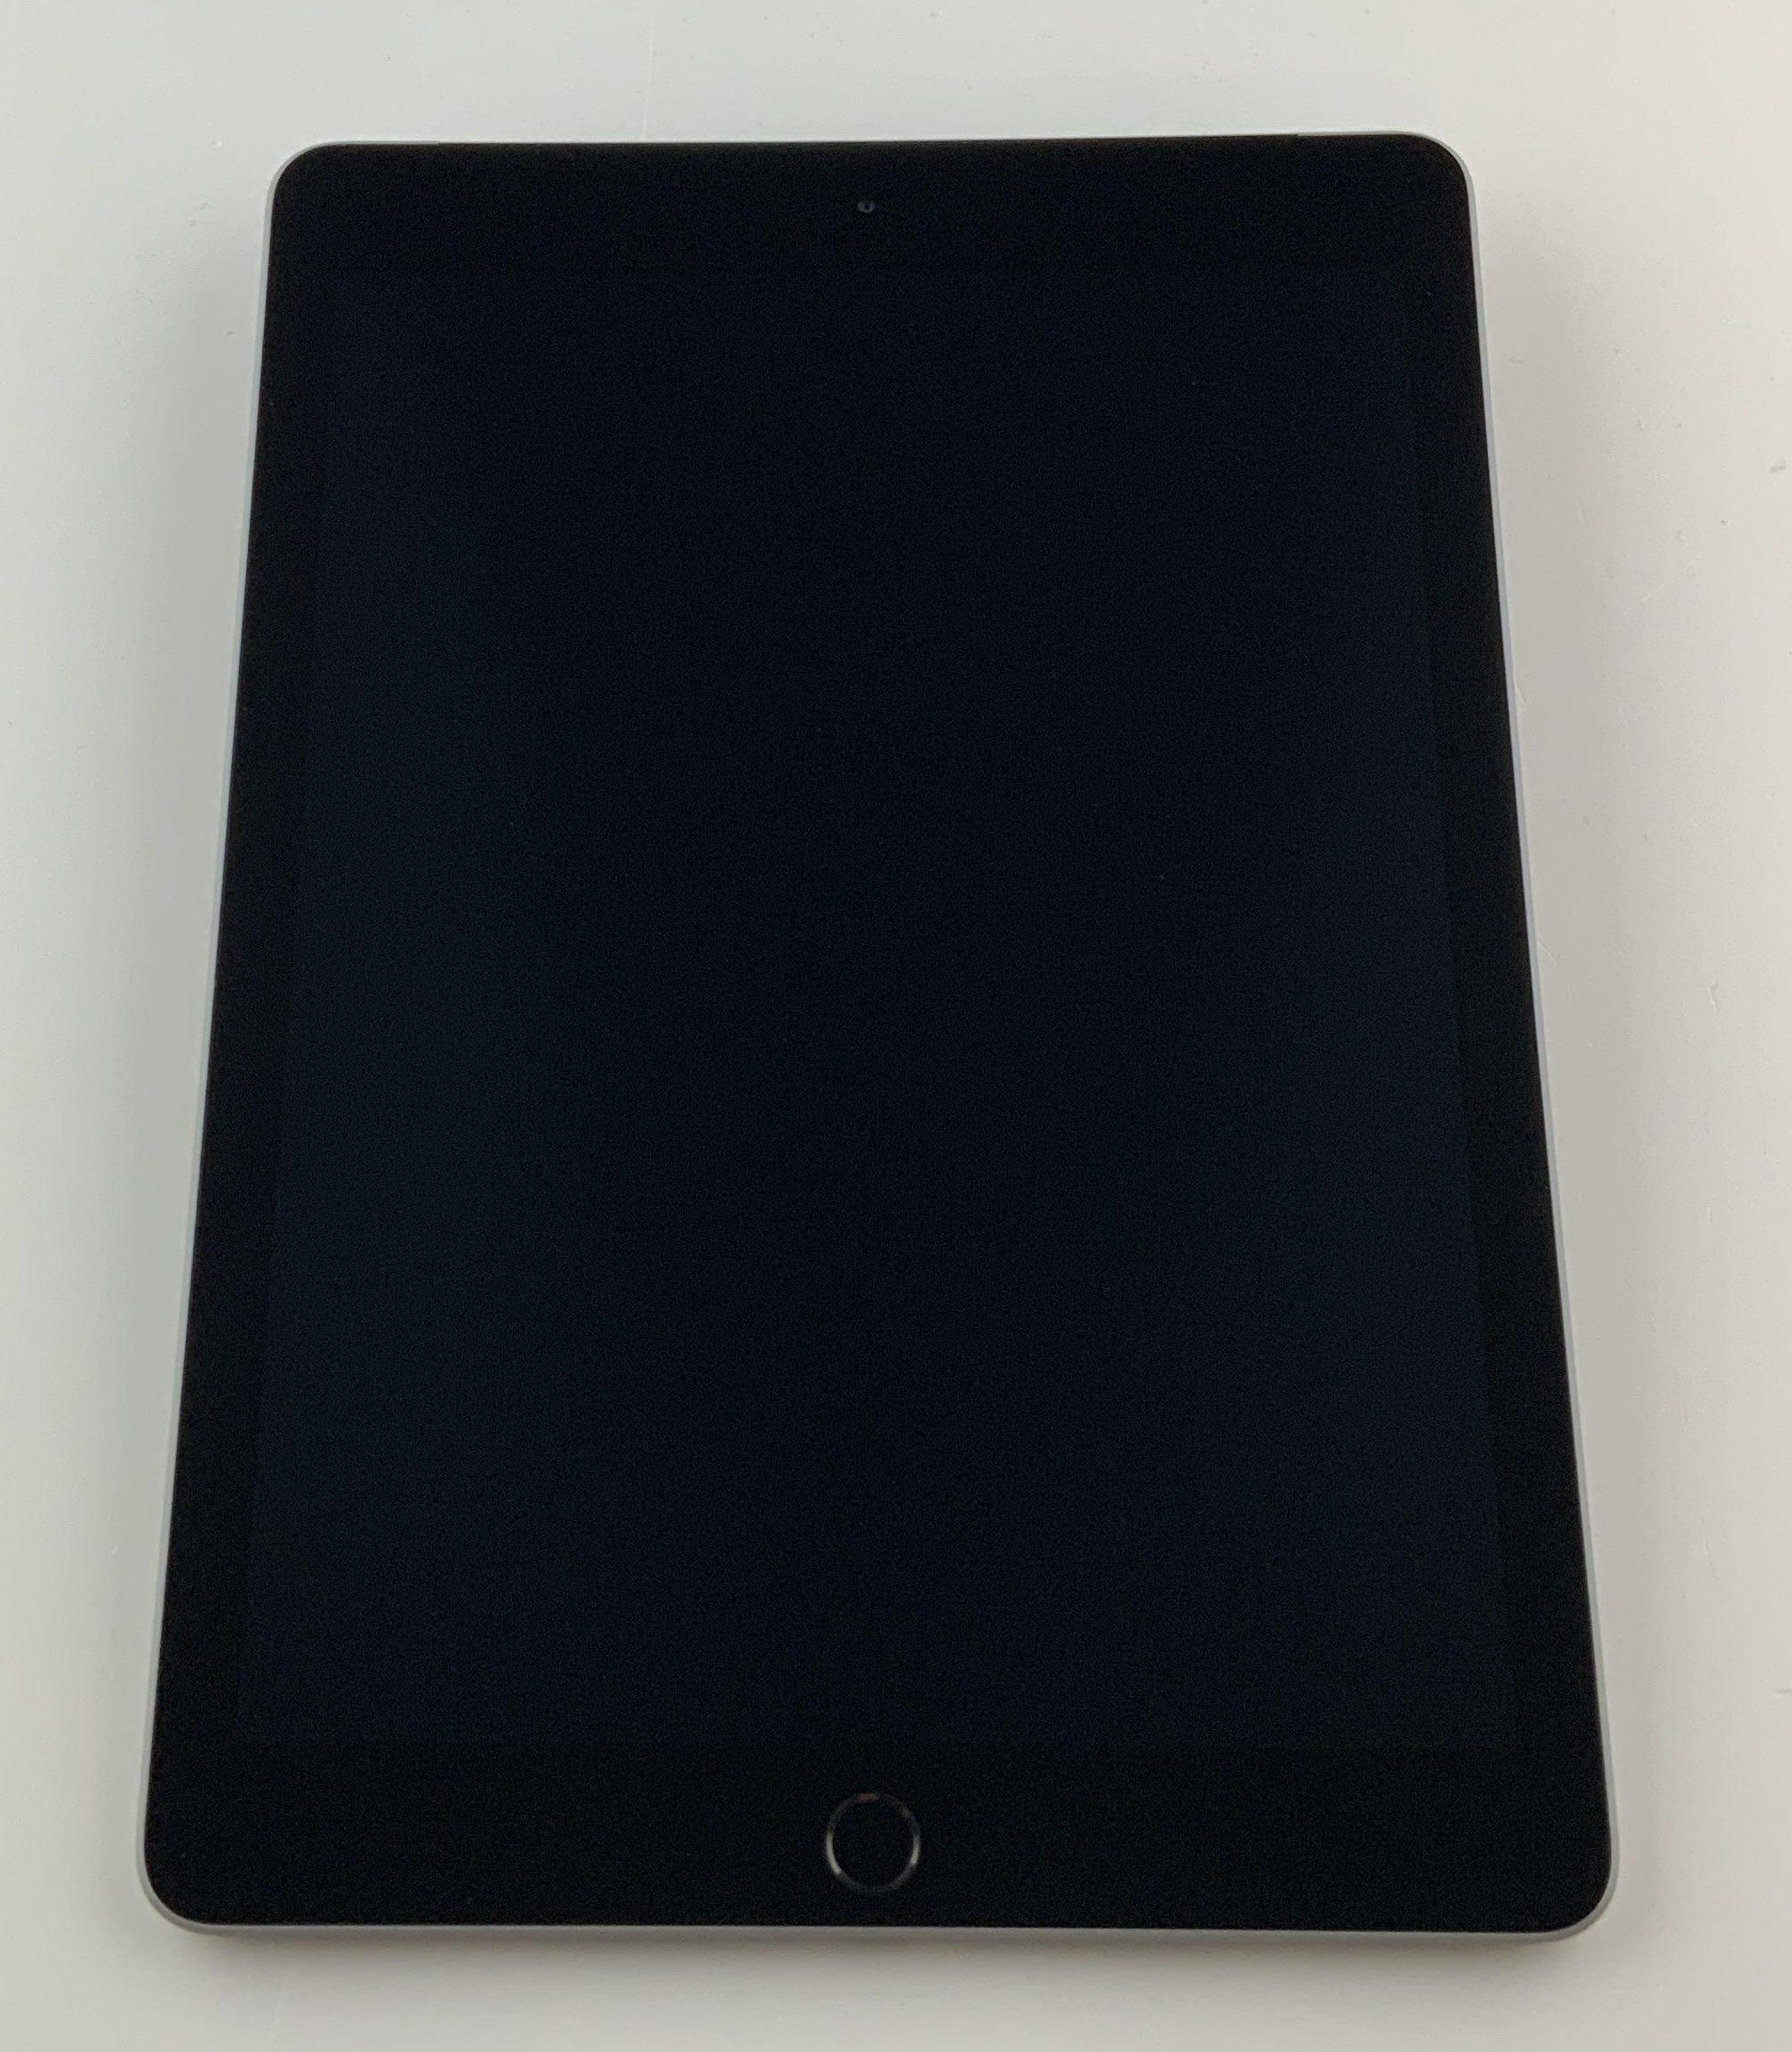 iPad 6 Wi-Fi + Cellular 32GB, 32GB, Space Gray, Bild 1